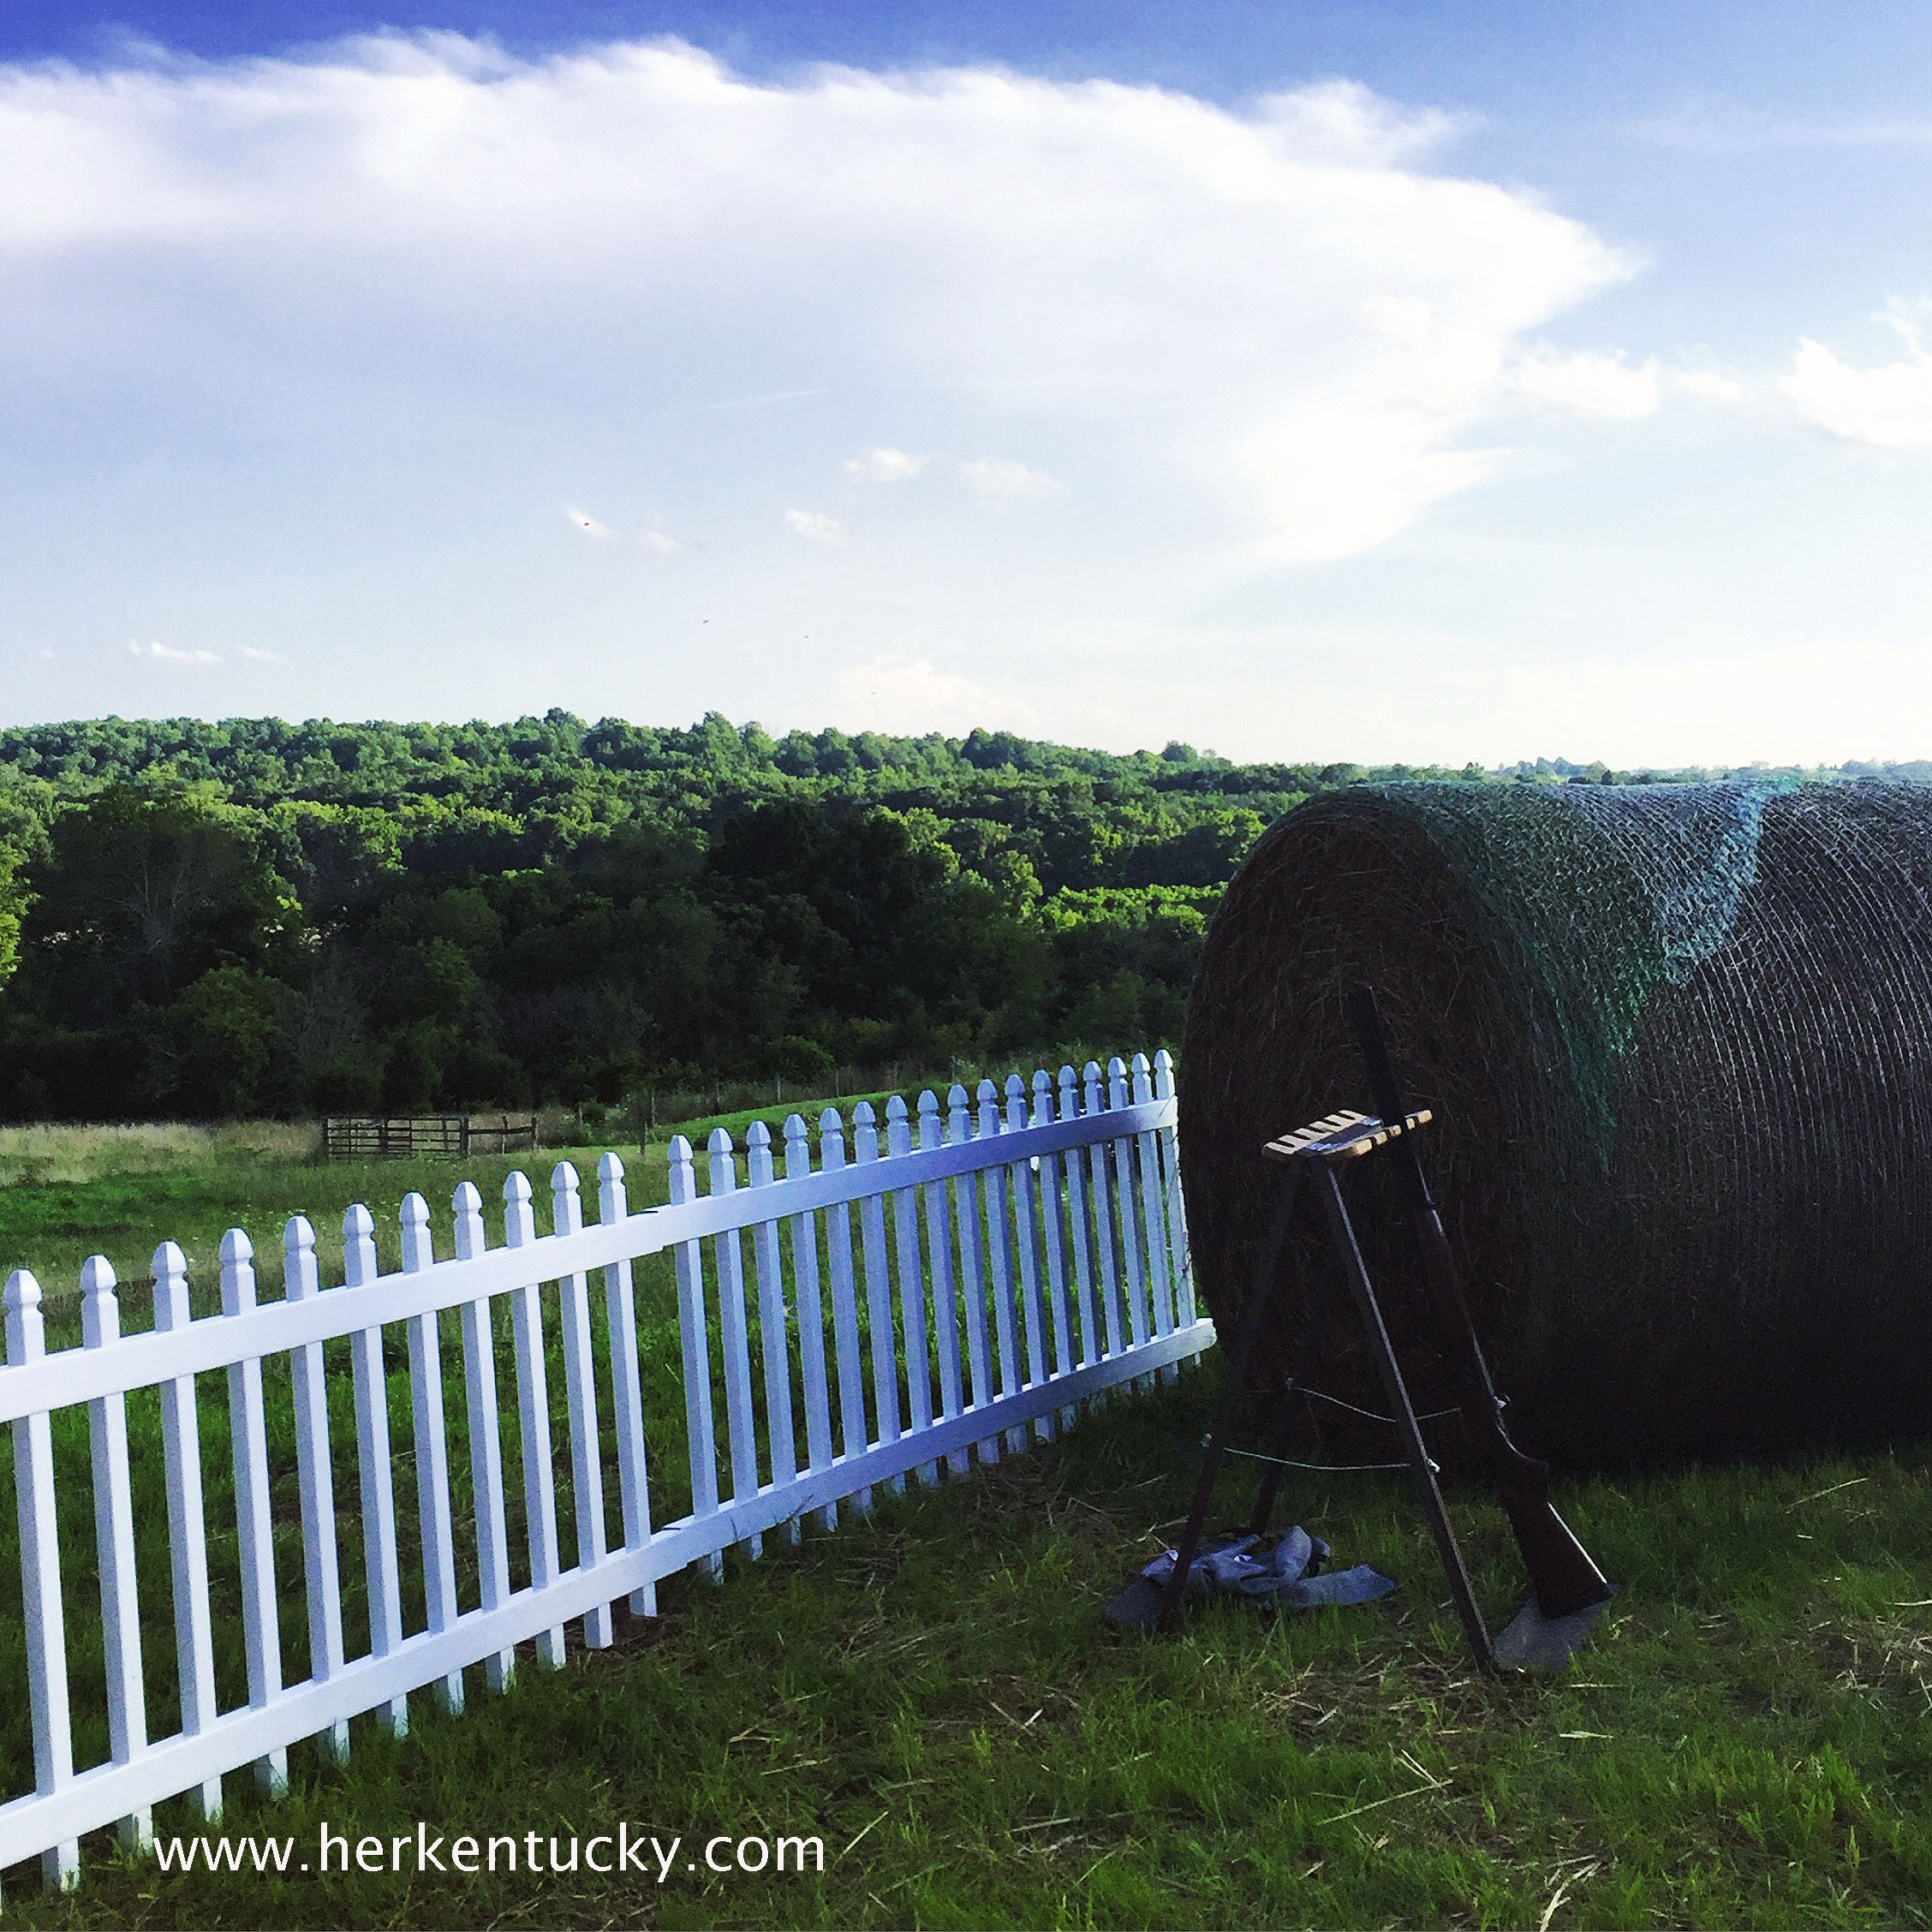 Ashbourne Farm | Louisville KY Lifestyle Blog | HerKentucky.com